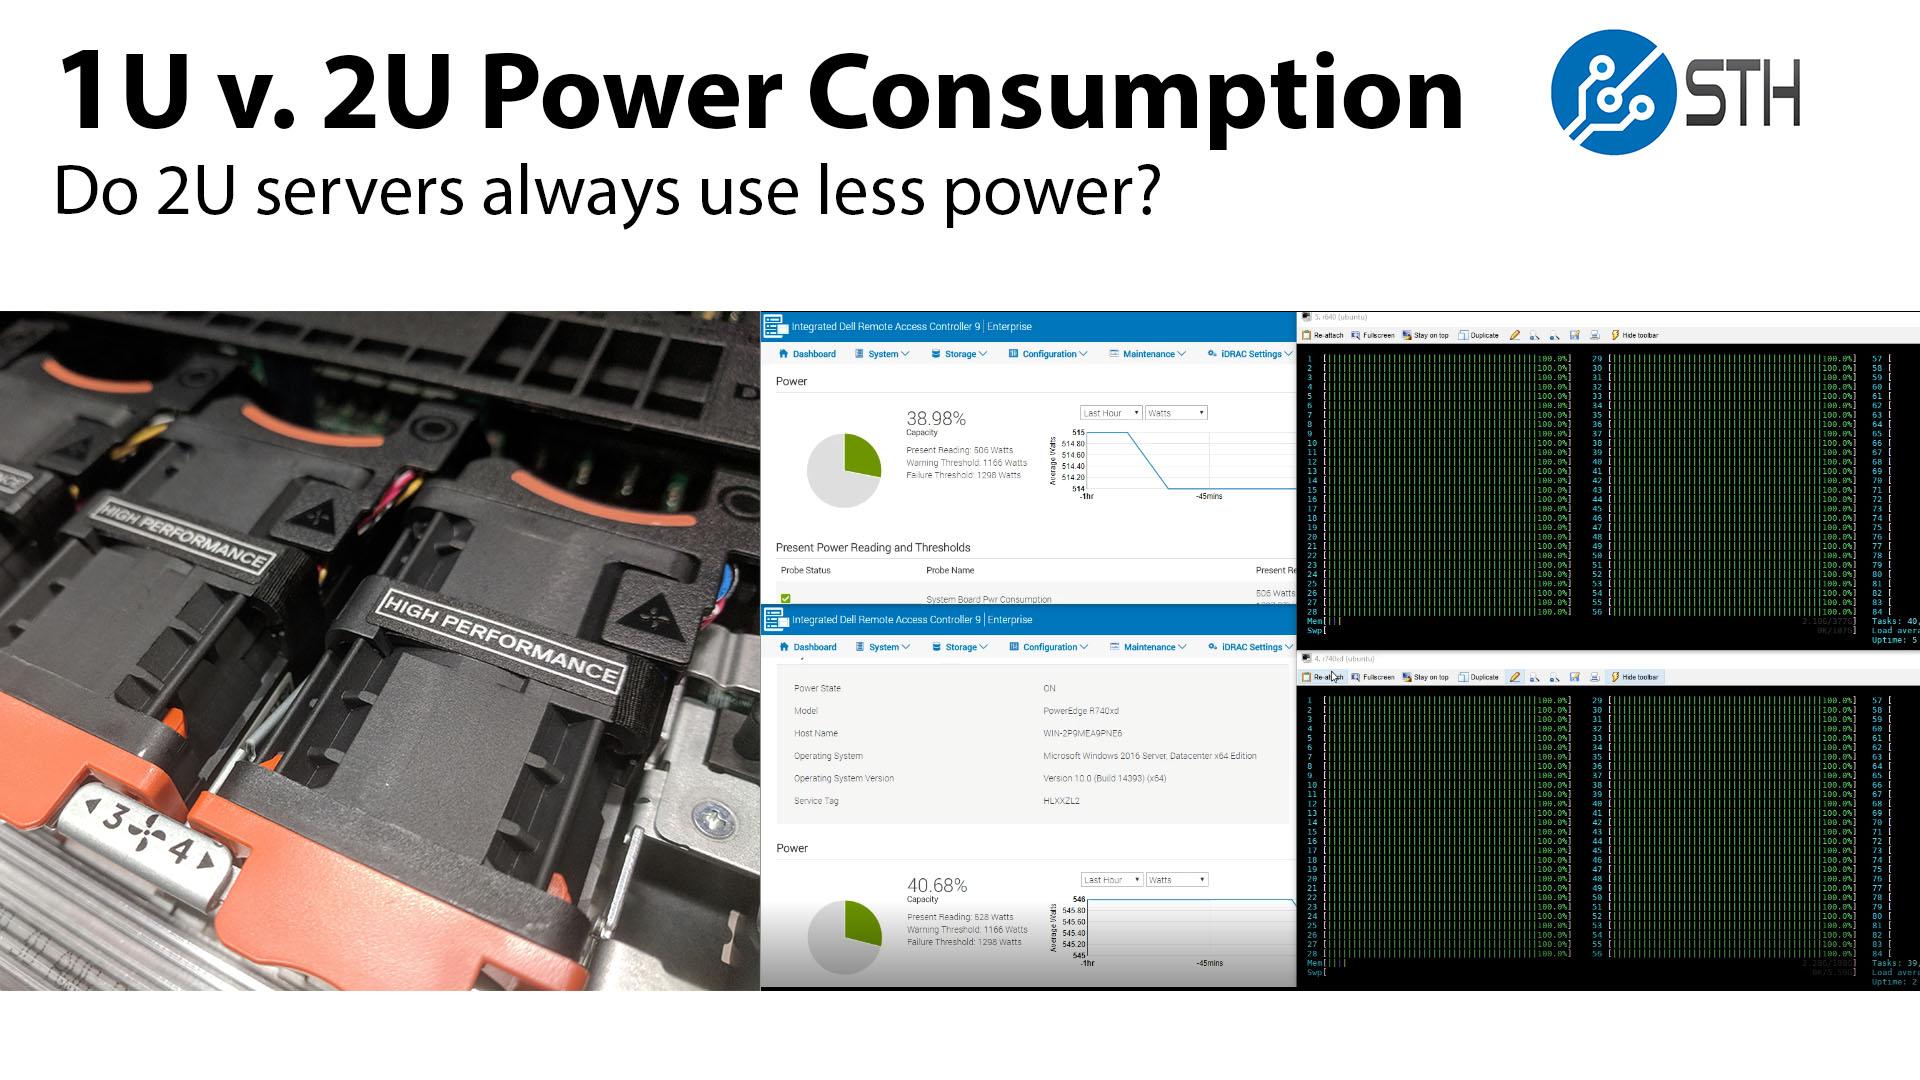 Testing Conventional Wisdom in 1U v 2U Power Consumption